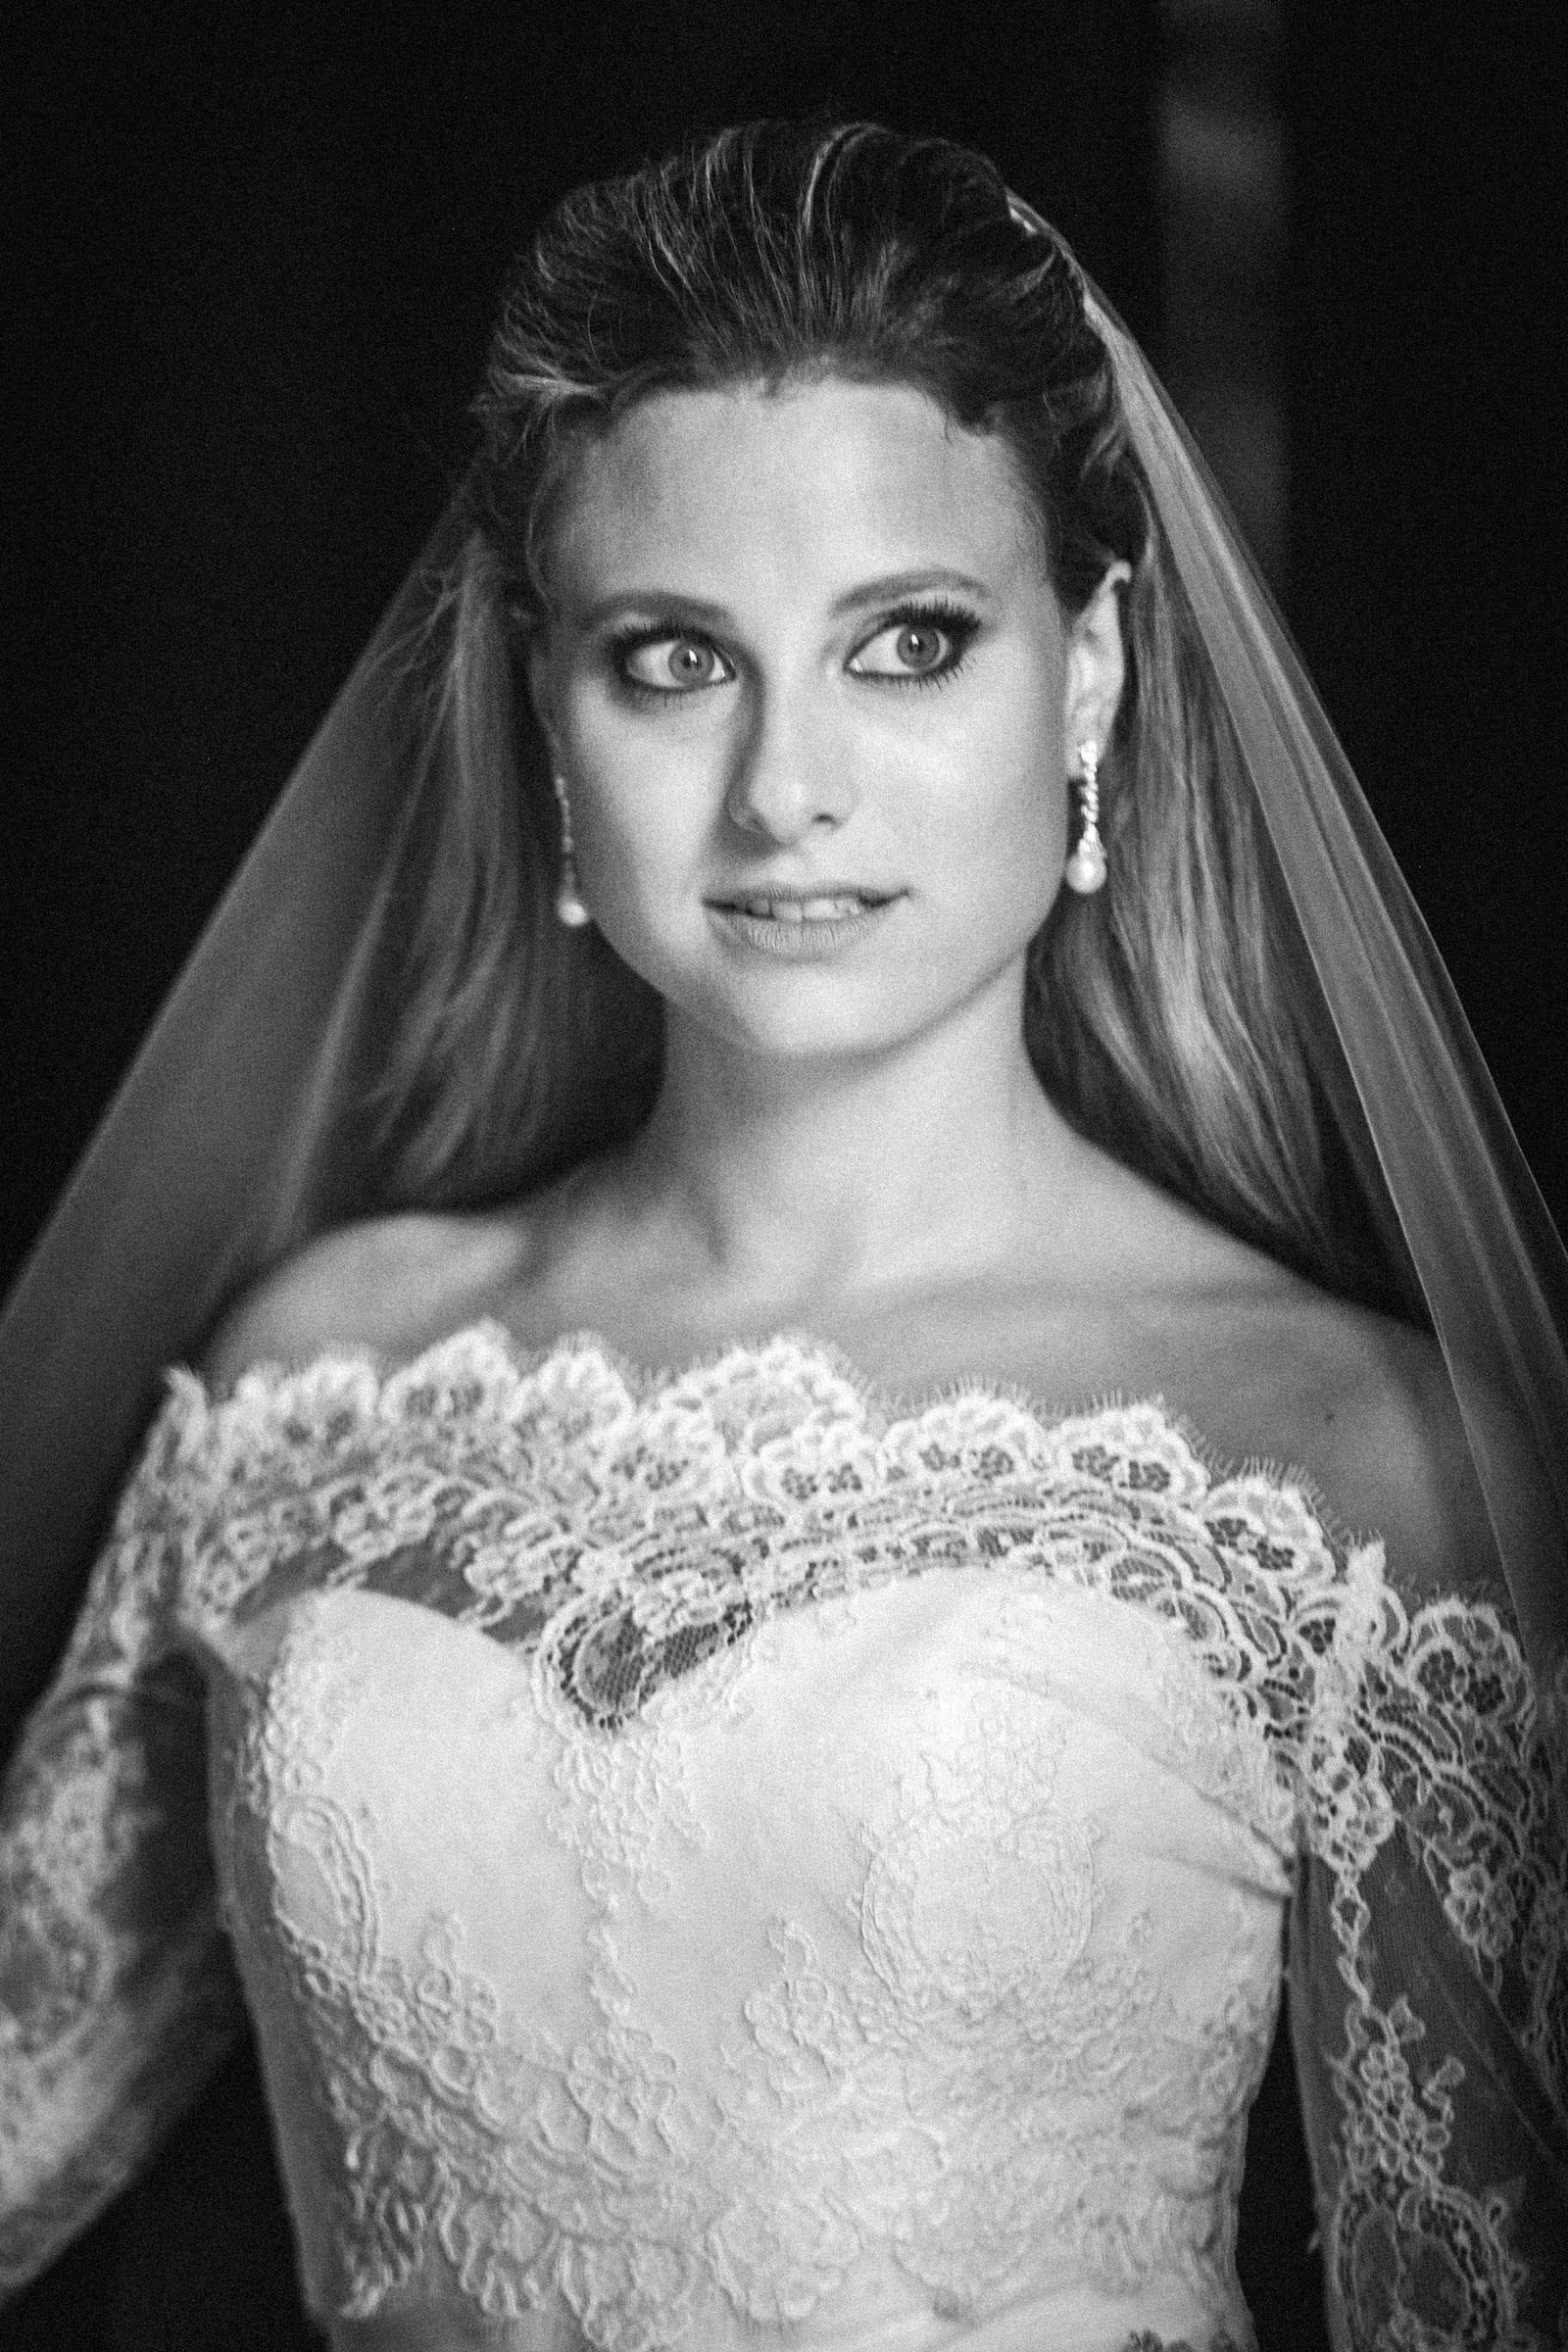 Duke Chapel Wedding - Bridal Photo B&W in Doorway Antique Lens